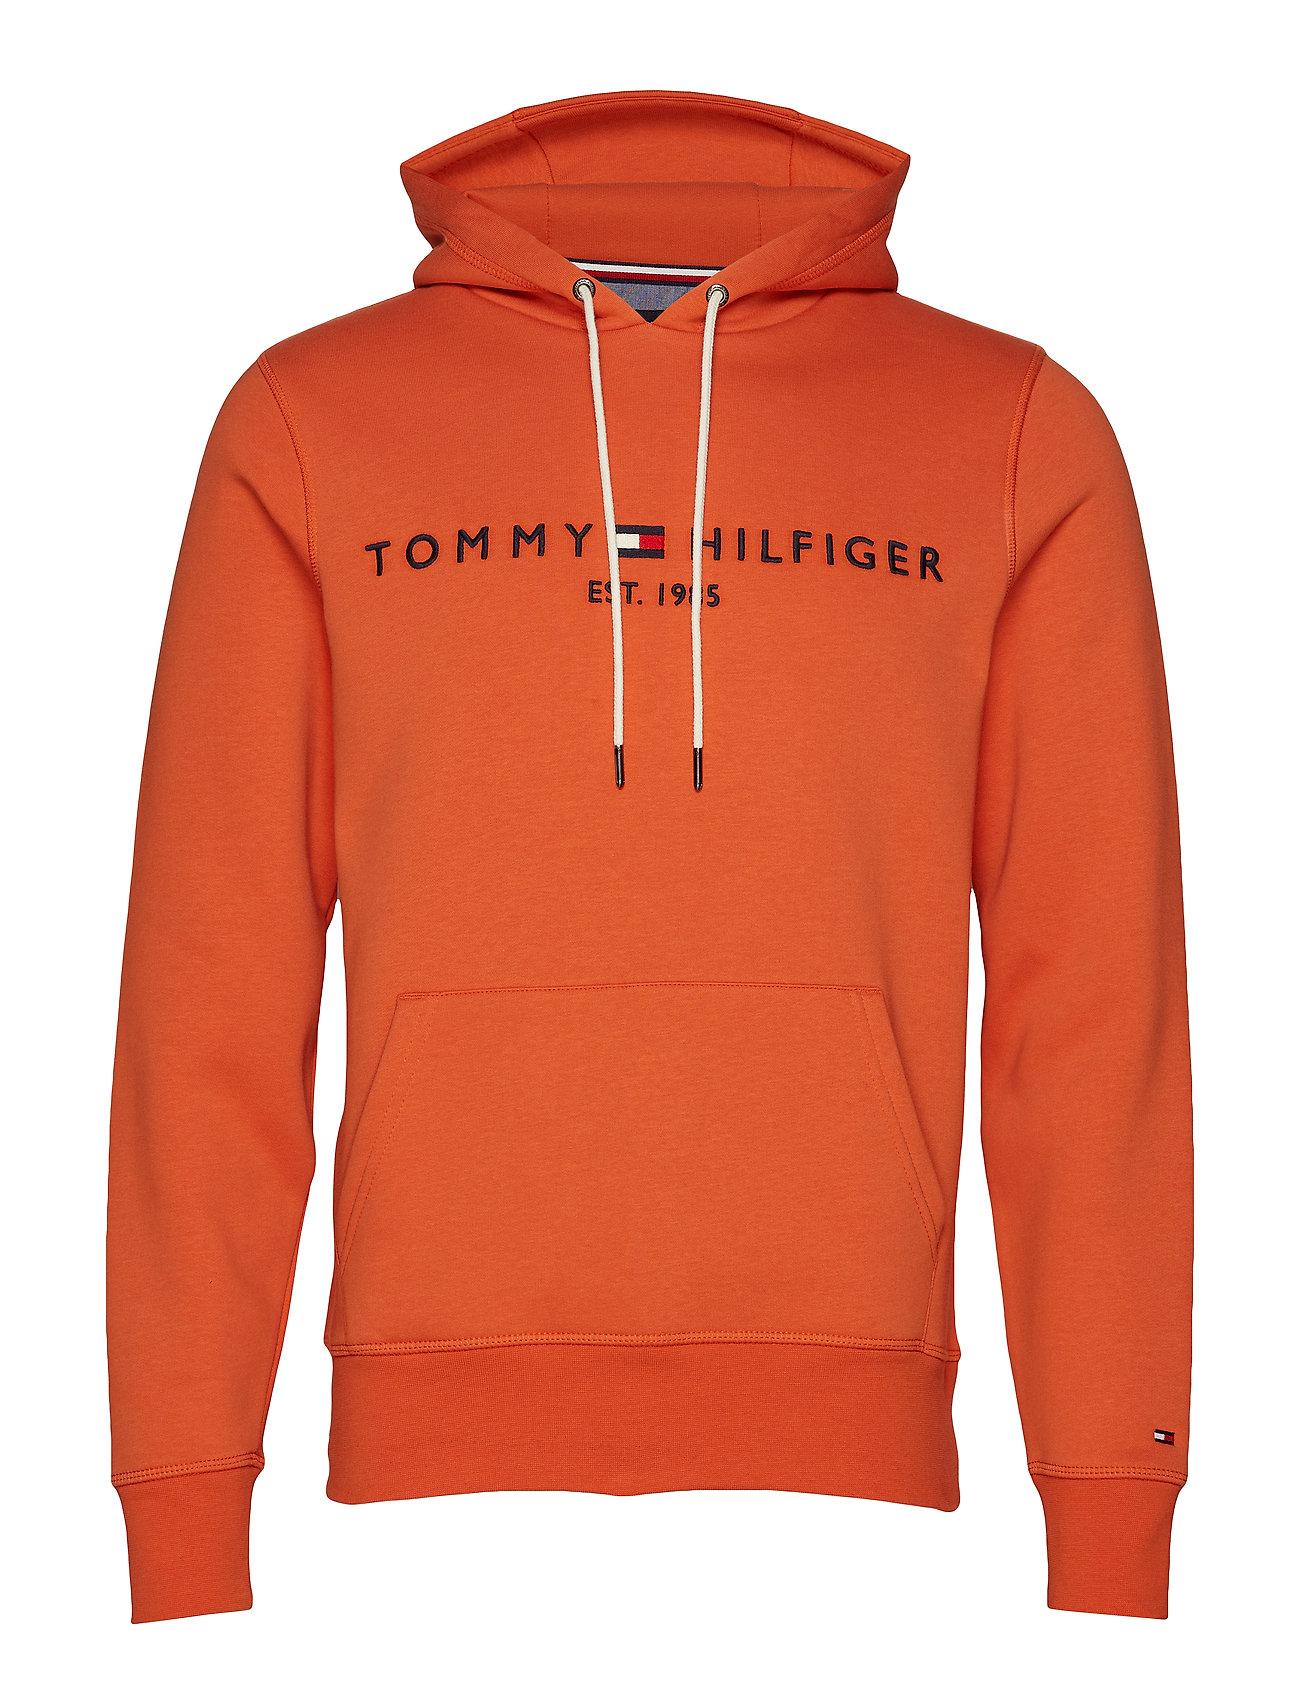 Image of Tommy Logo Hoody Hoodie Trøje Orange Tommy Hilfiger (3452146879)